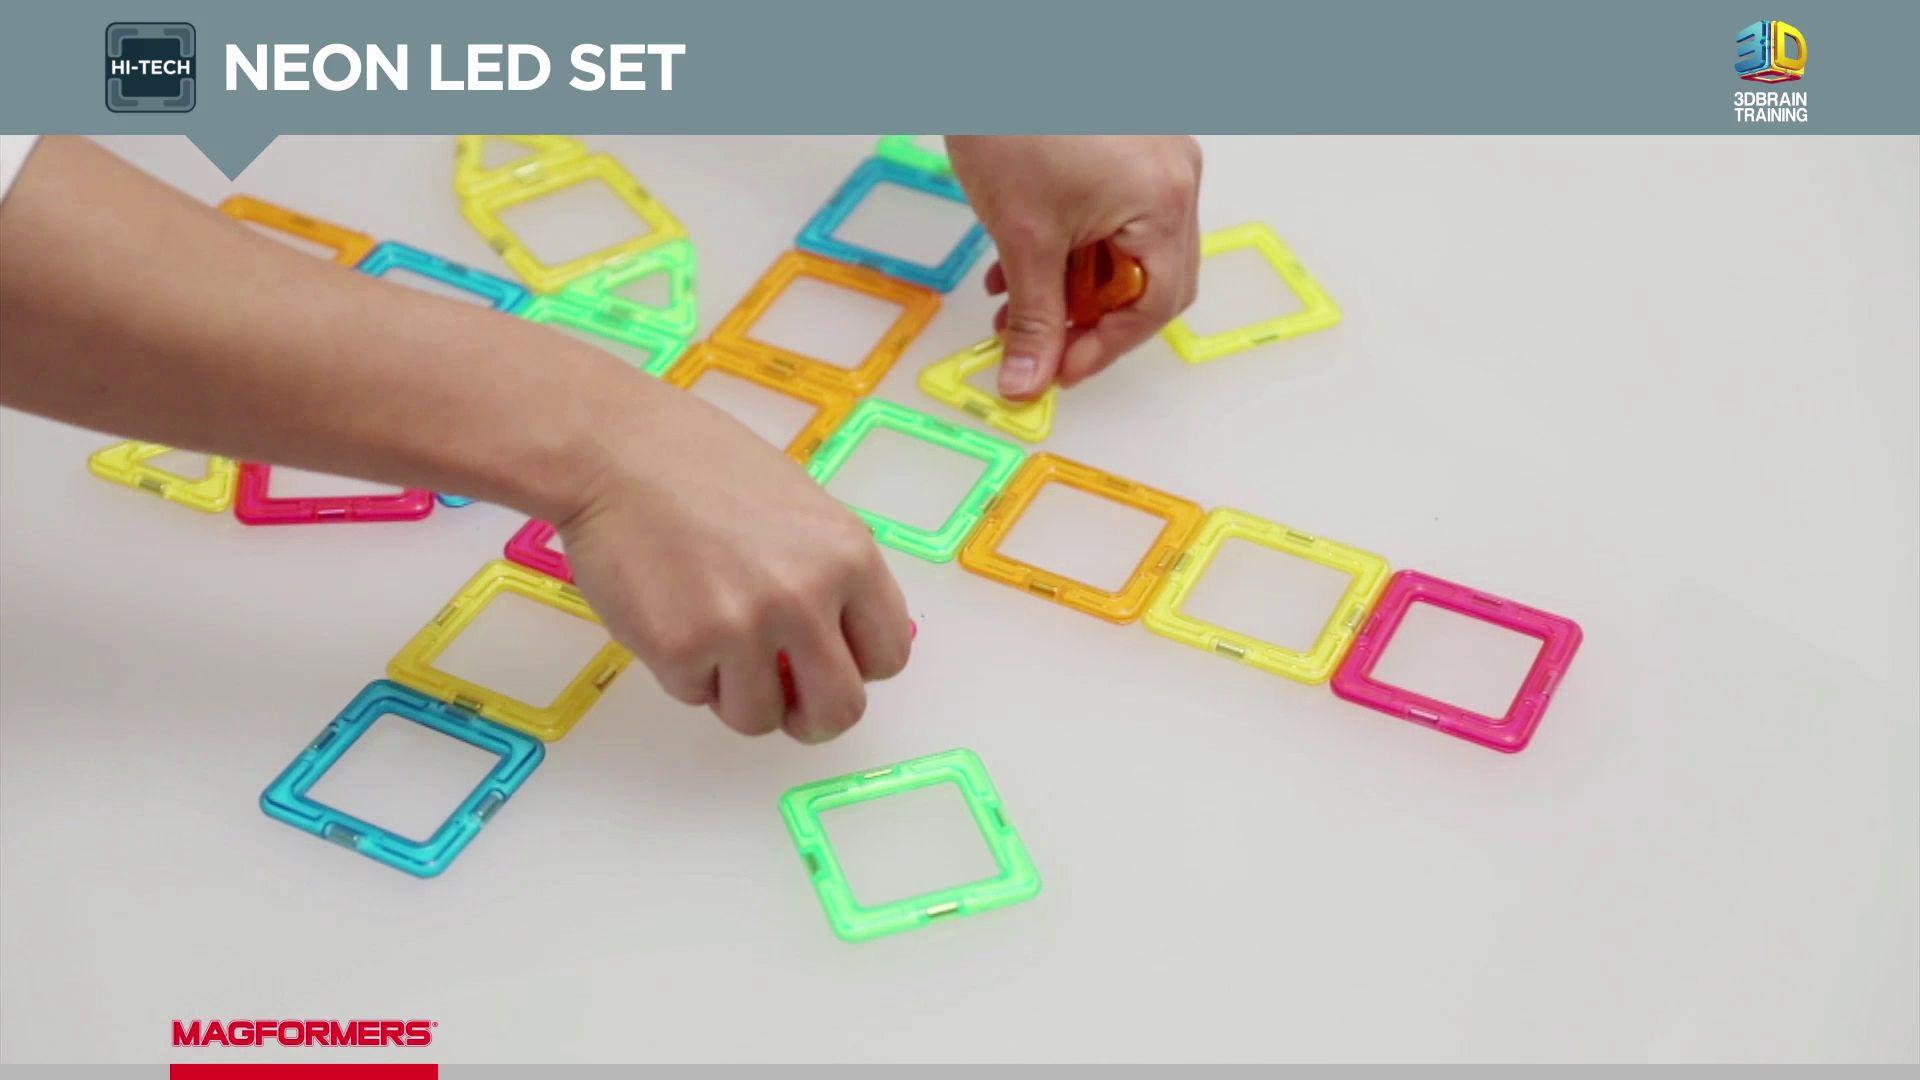 Magformers Hi-Tech Neon LED Set